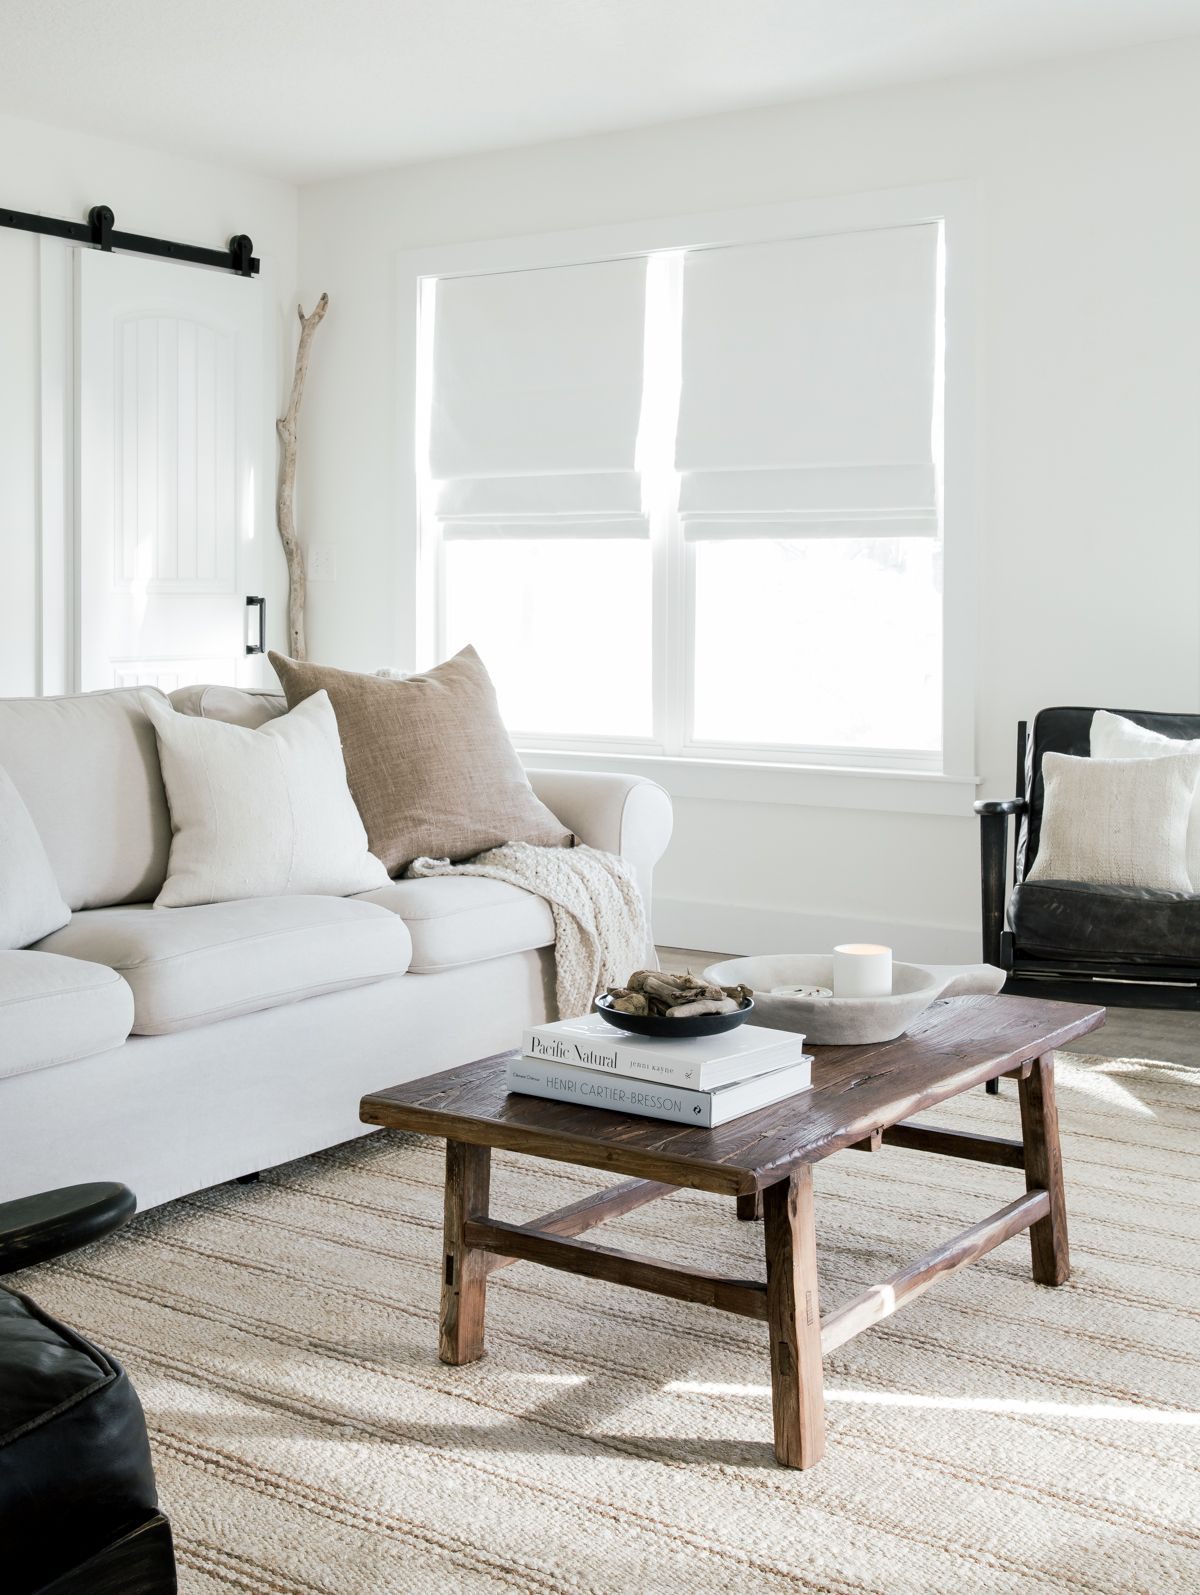 Living Room Rug Guide & Neutral Rug Roundup | Rugs in ...